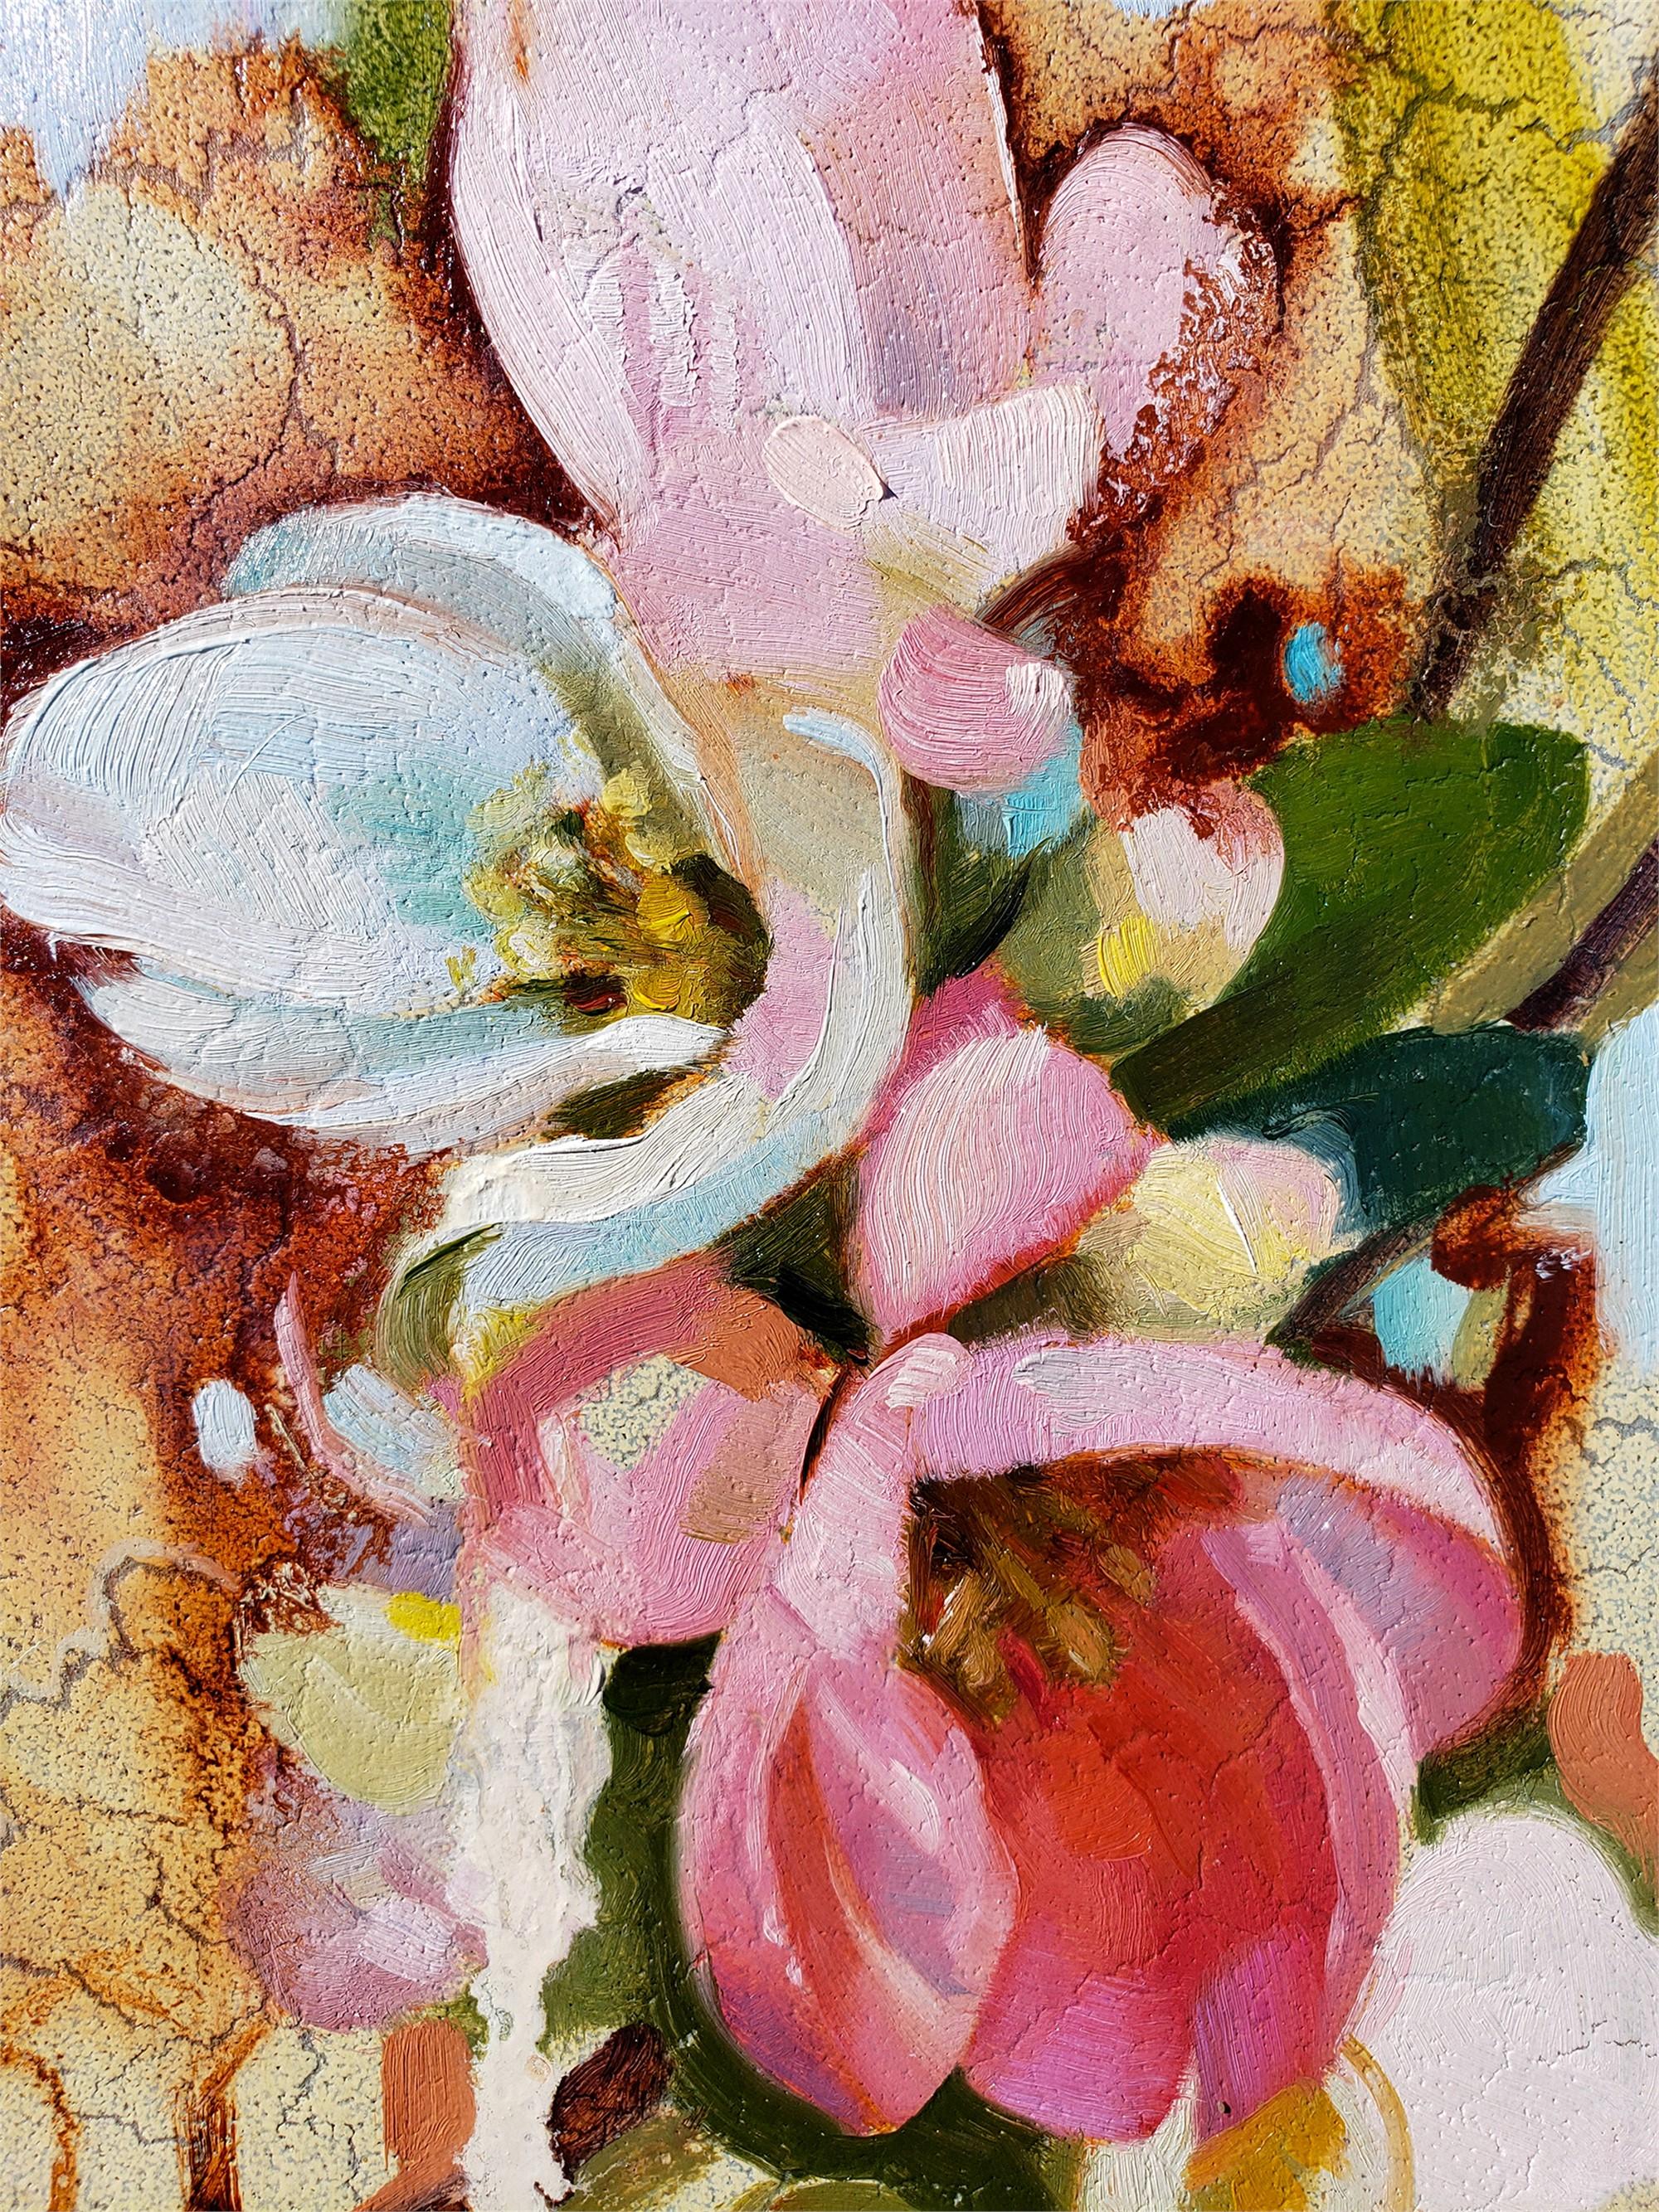 Spring Blooming by Ryan Morse